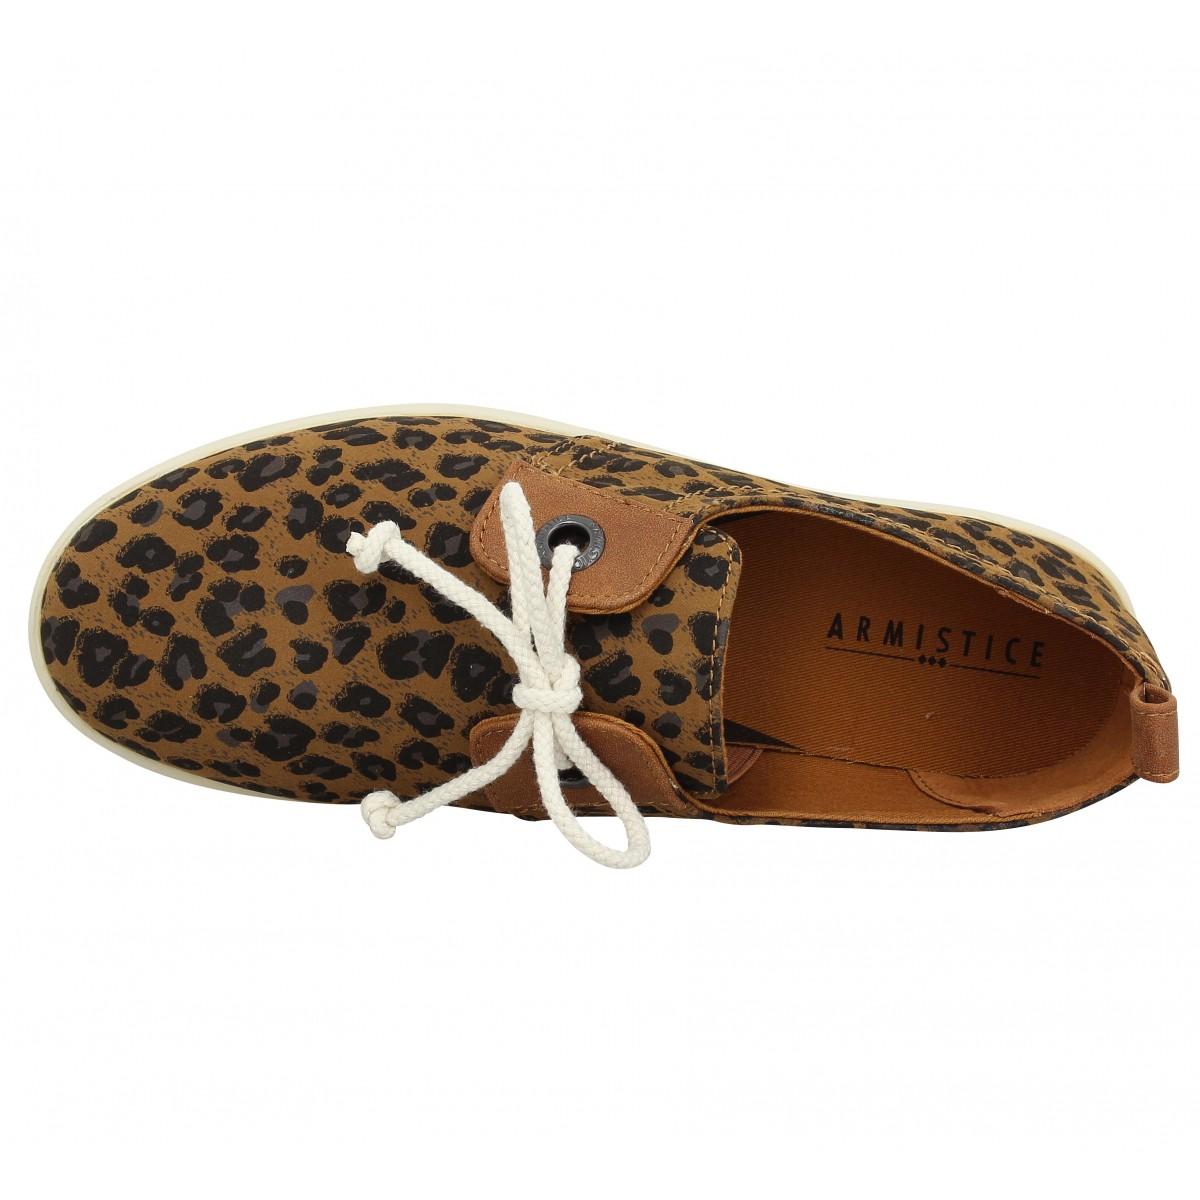 soldes armistice stone one toile leopard femme camel femme fanny chaussures. Black Bedroom Furniture Sets. Home Design Ideas